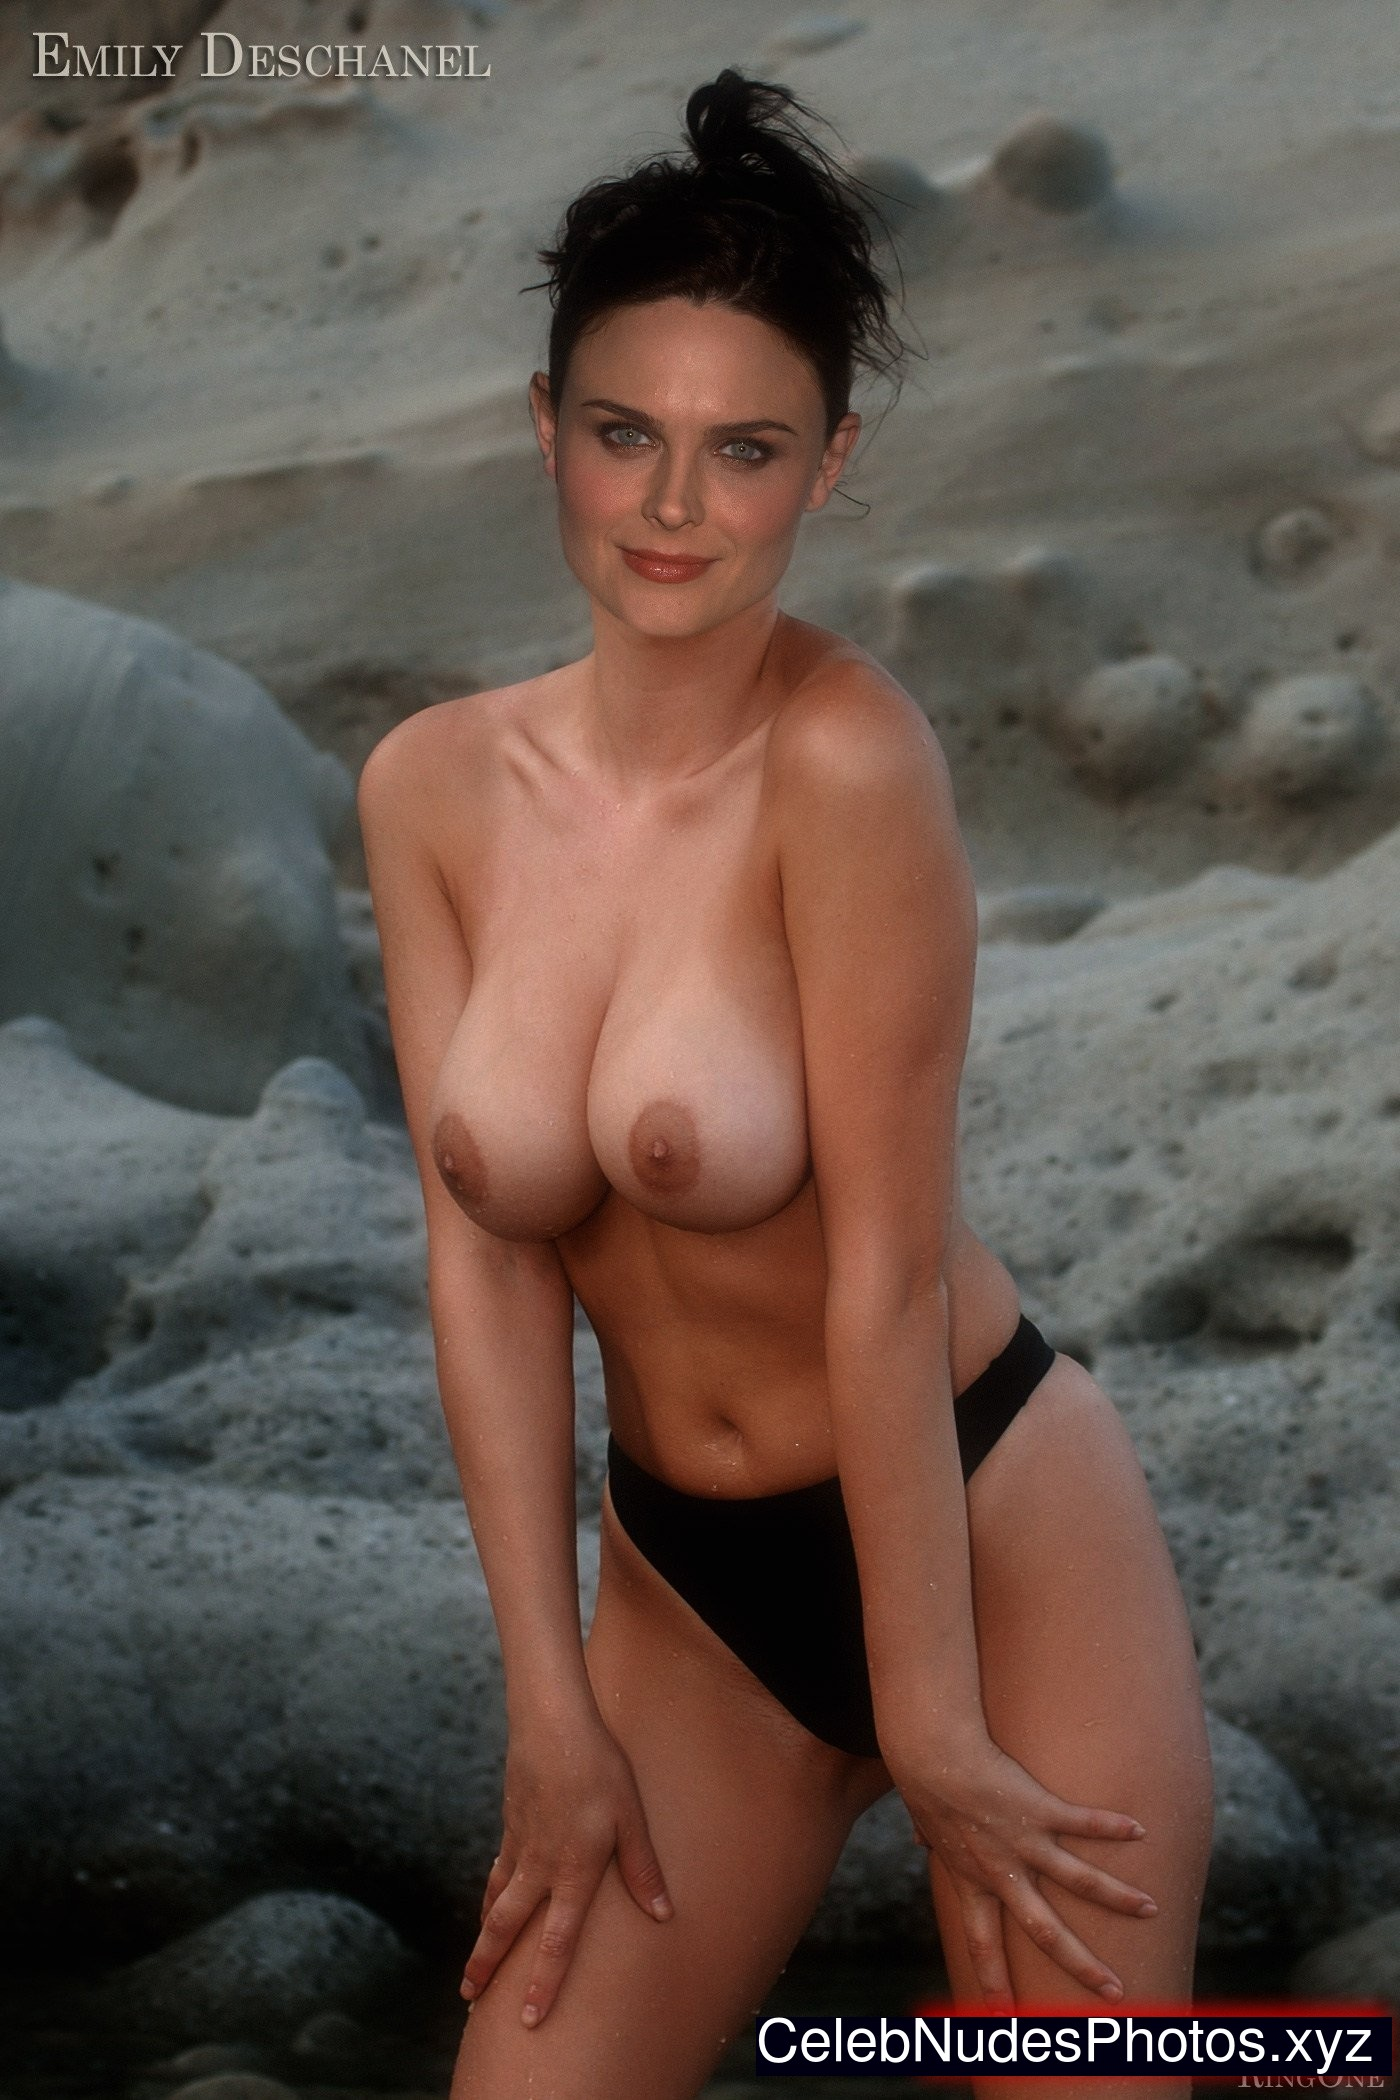 Topless emily deschanel